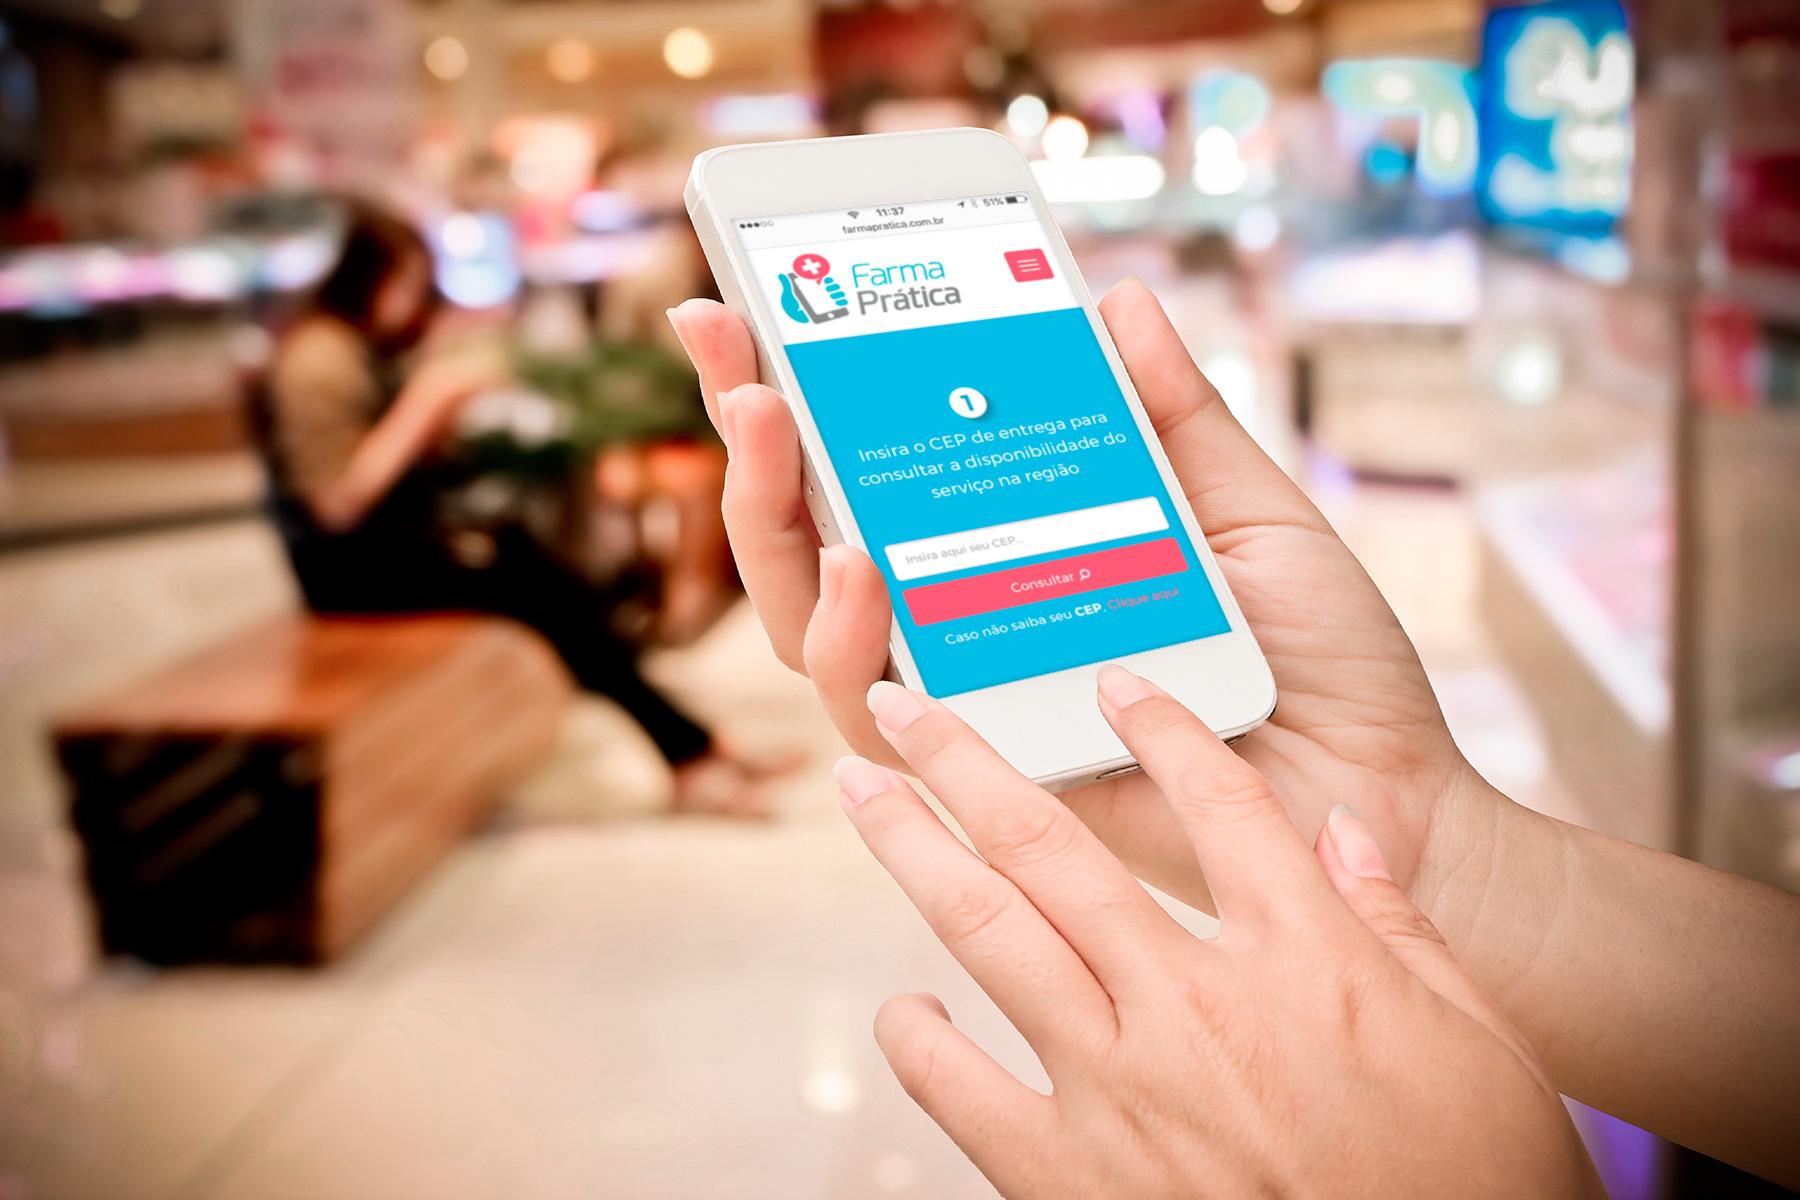 aplicativo facilita delivery de pequenas farmacias